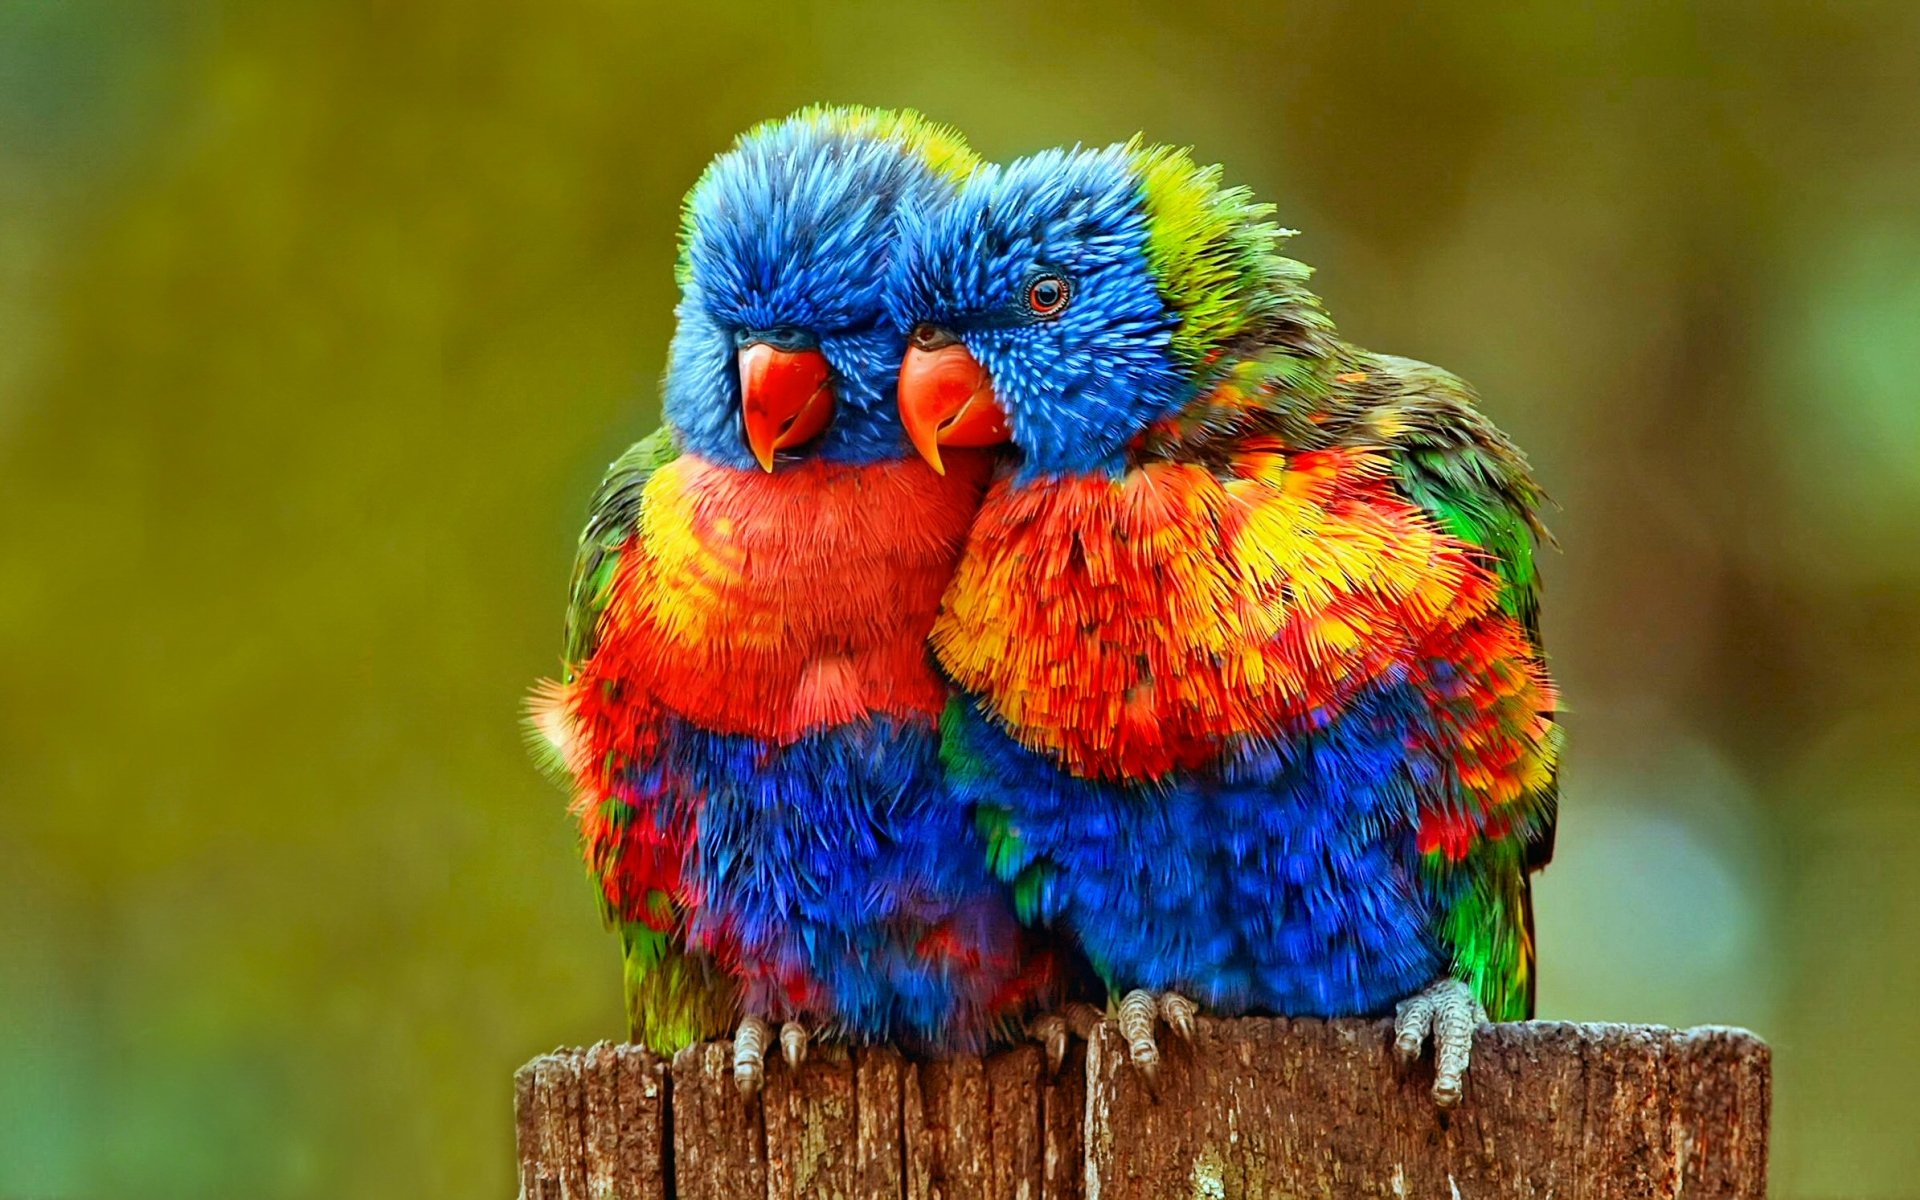 Animal - Rainbow Lorikeet  Lovebird Parrot Lorikeet Bird Colorful Close-Up Wallpaper